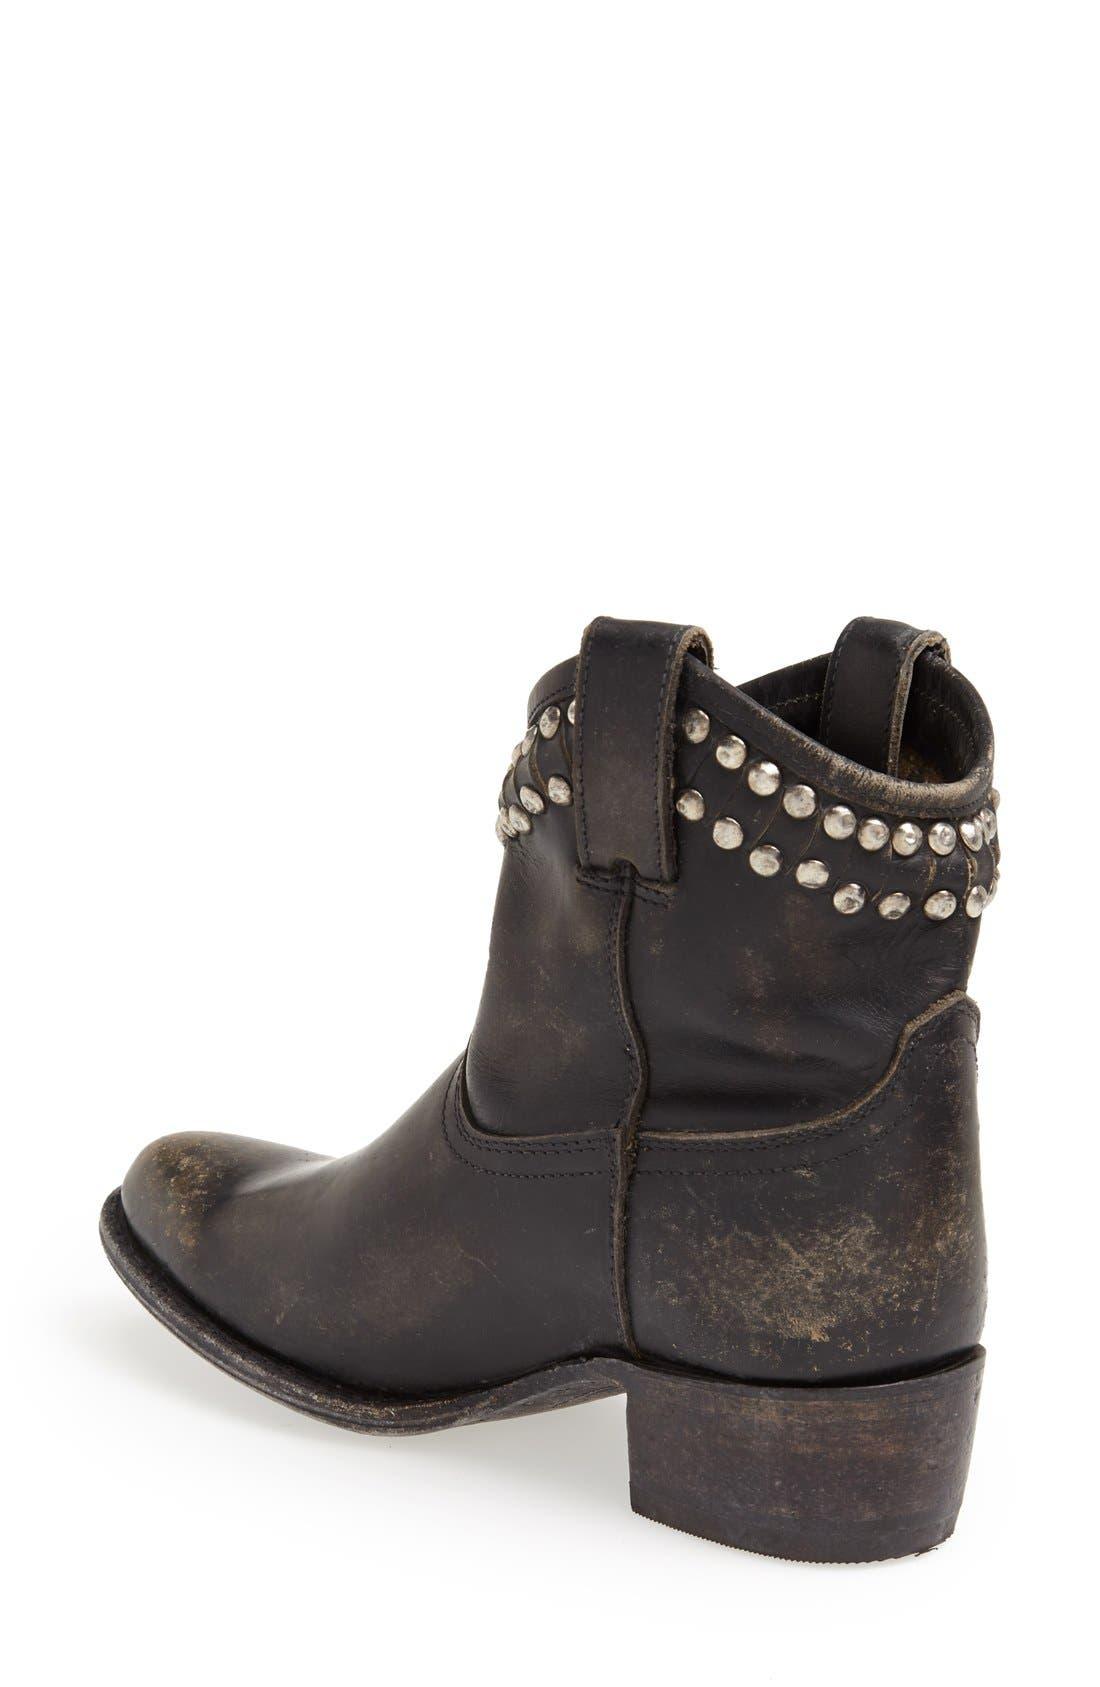 Alternate Image 2  - Frye 'Diana' Cut & Studded Leather Short Boot (Women)